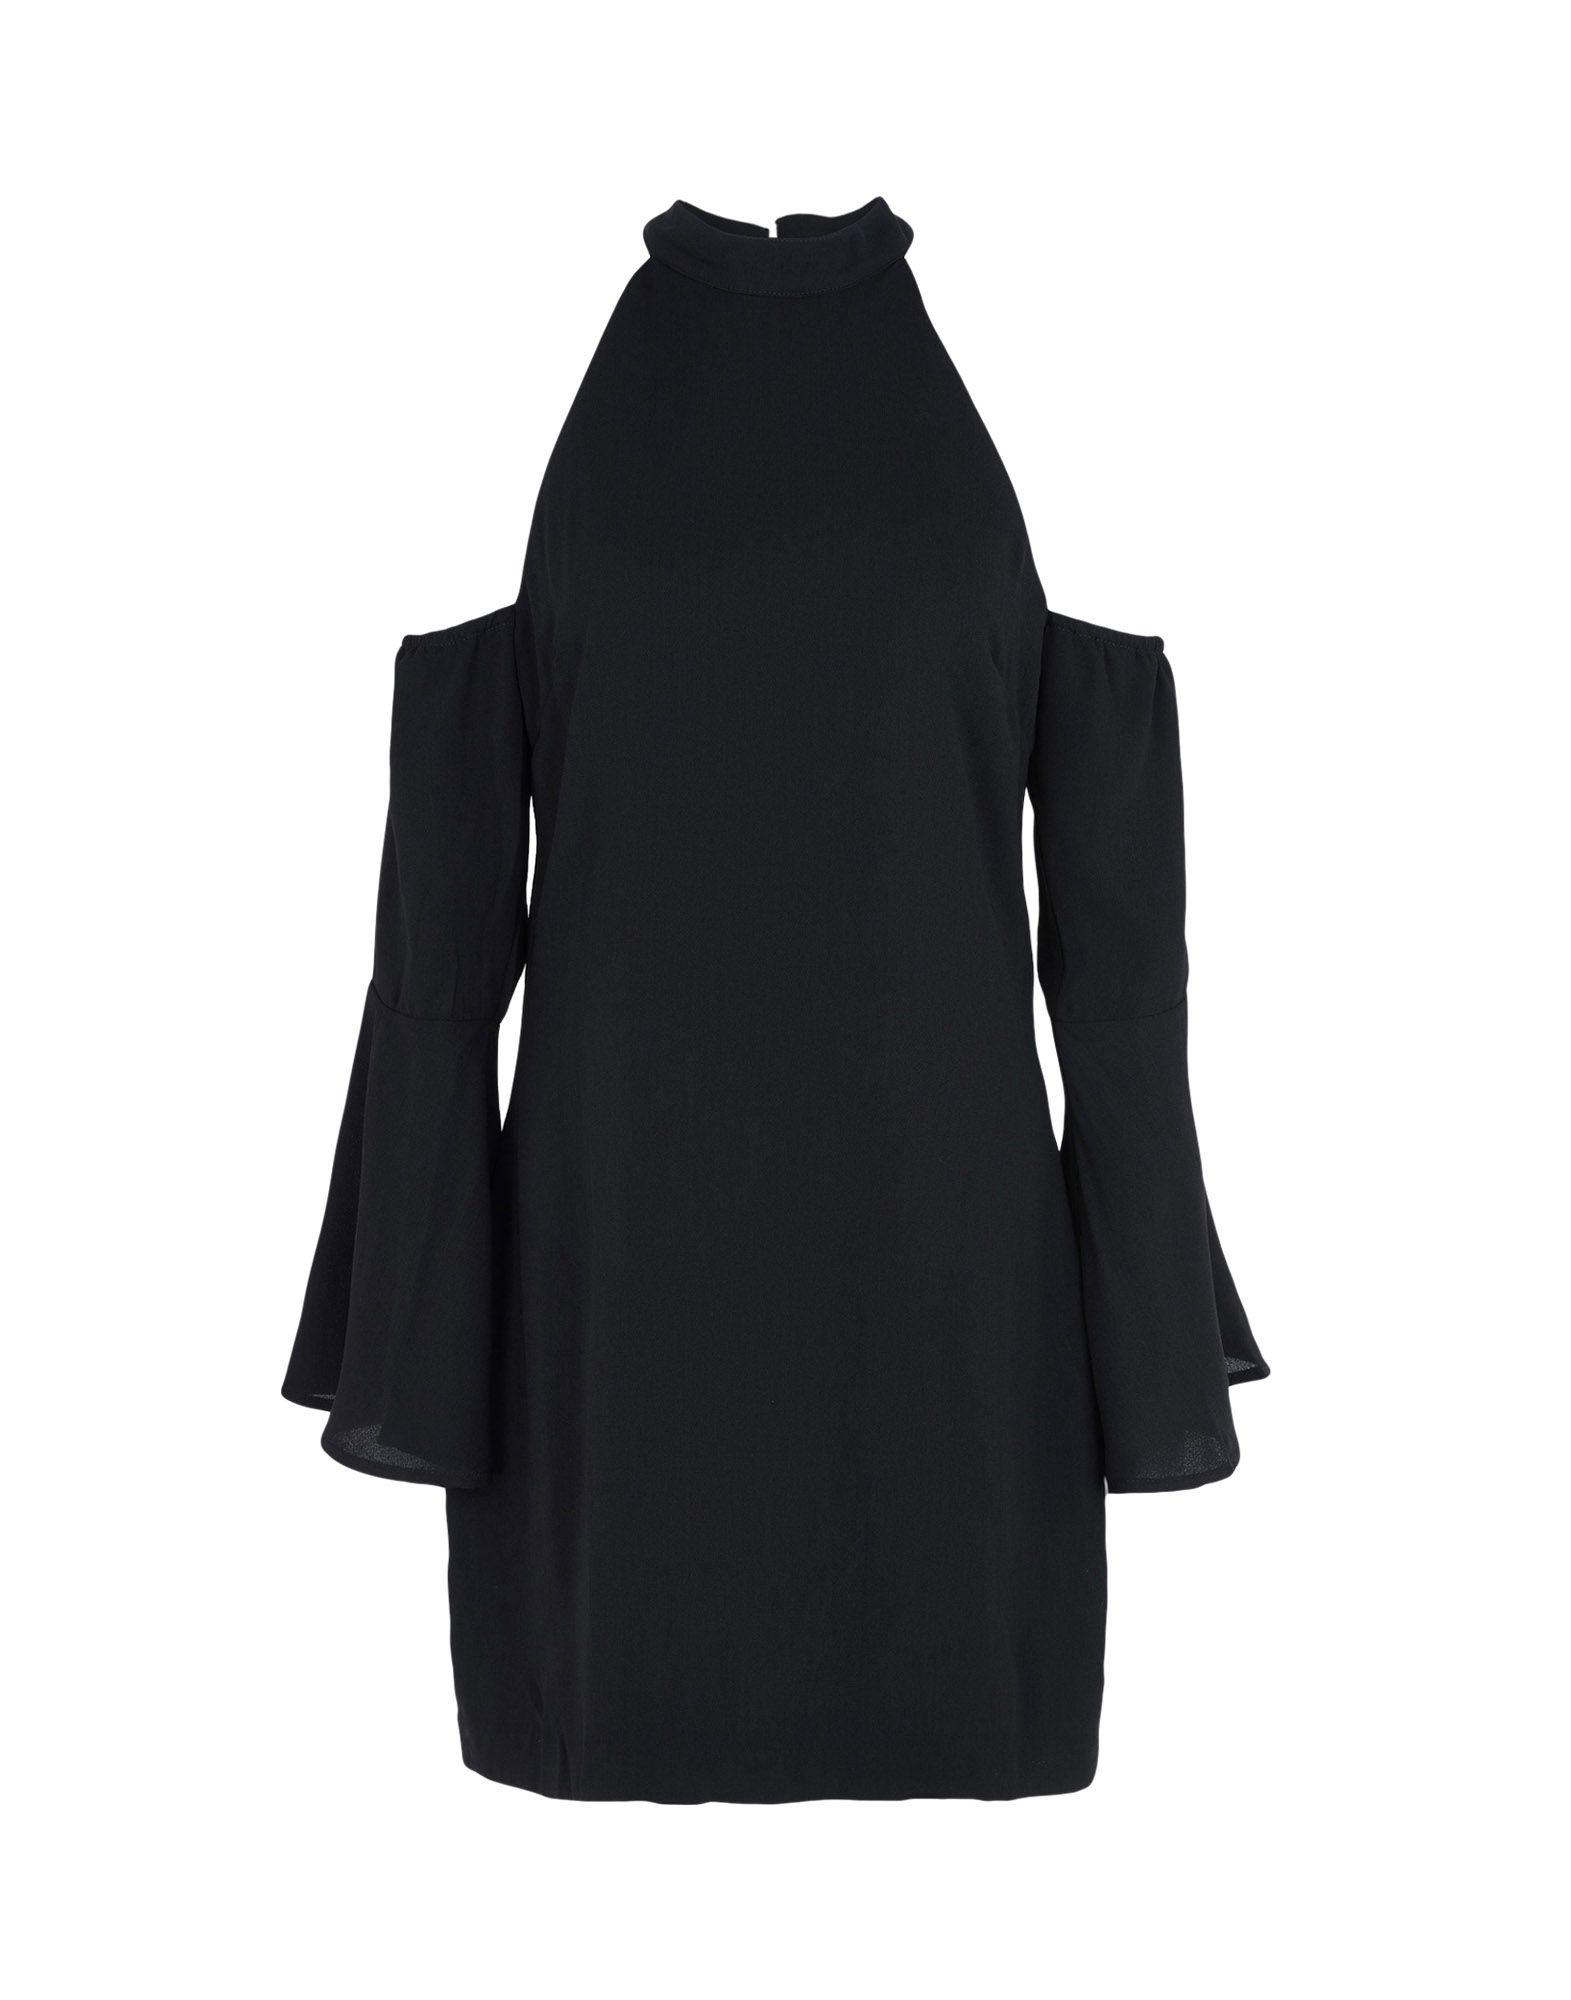 WYLDR Short Dress in Black